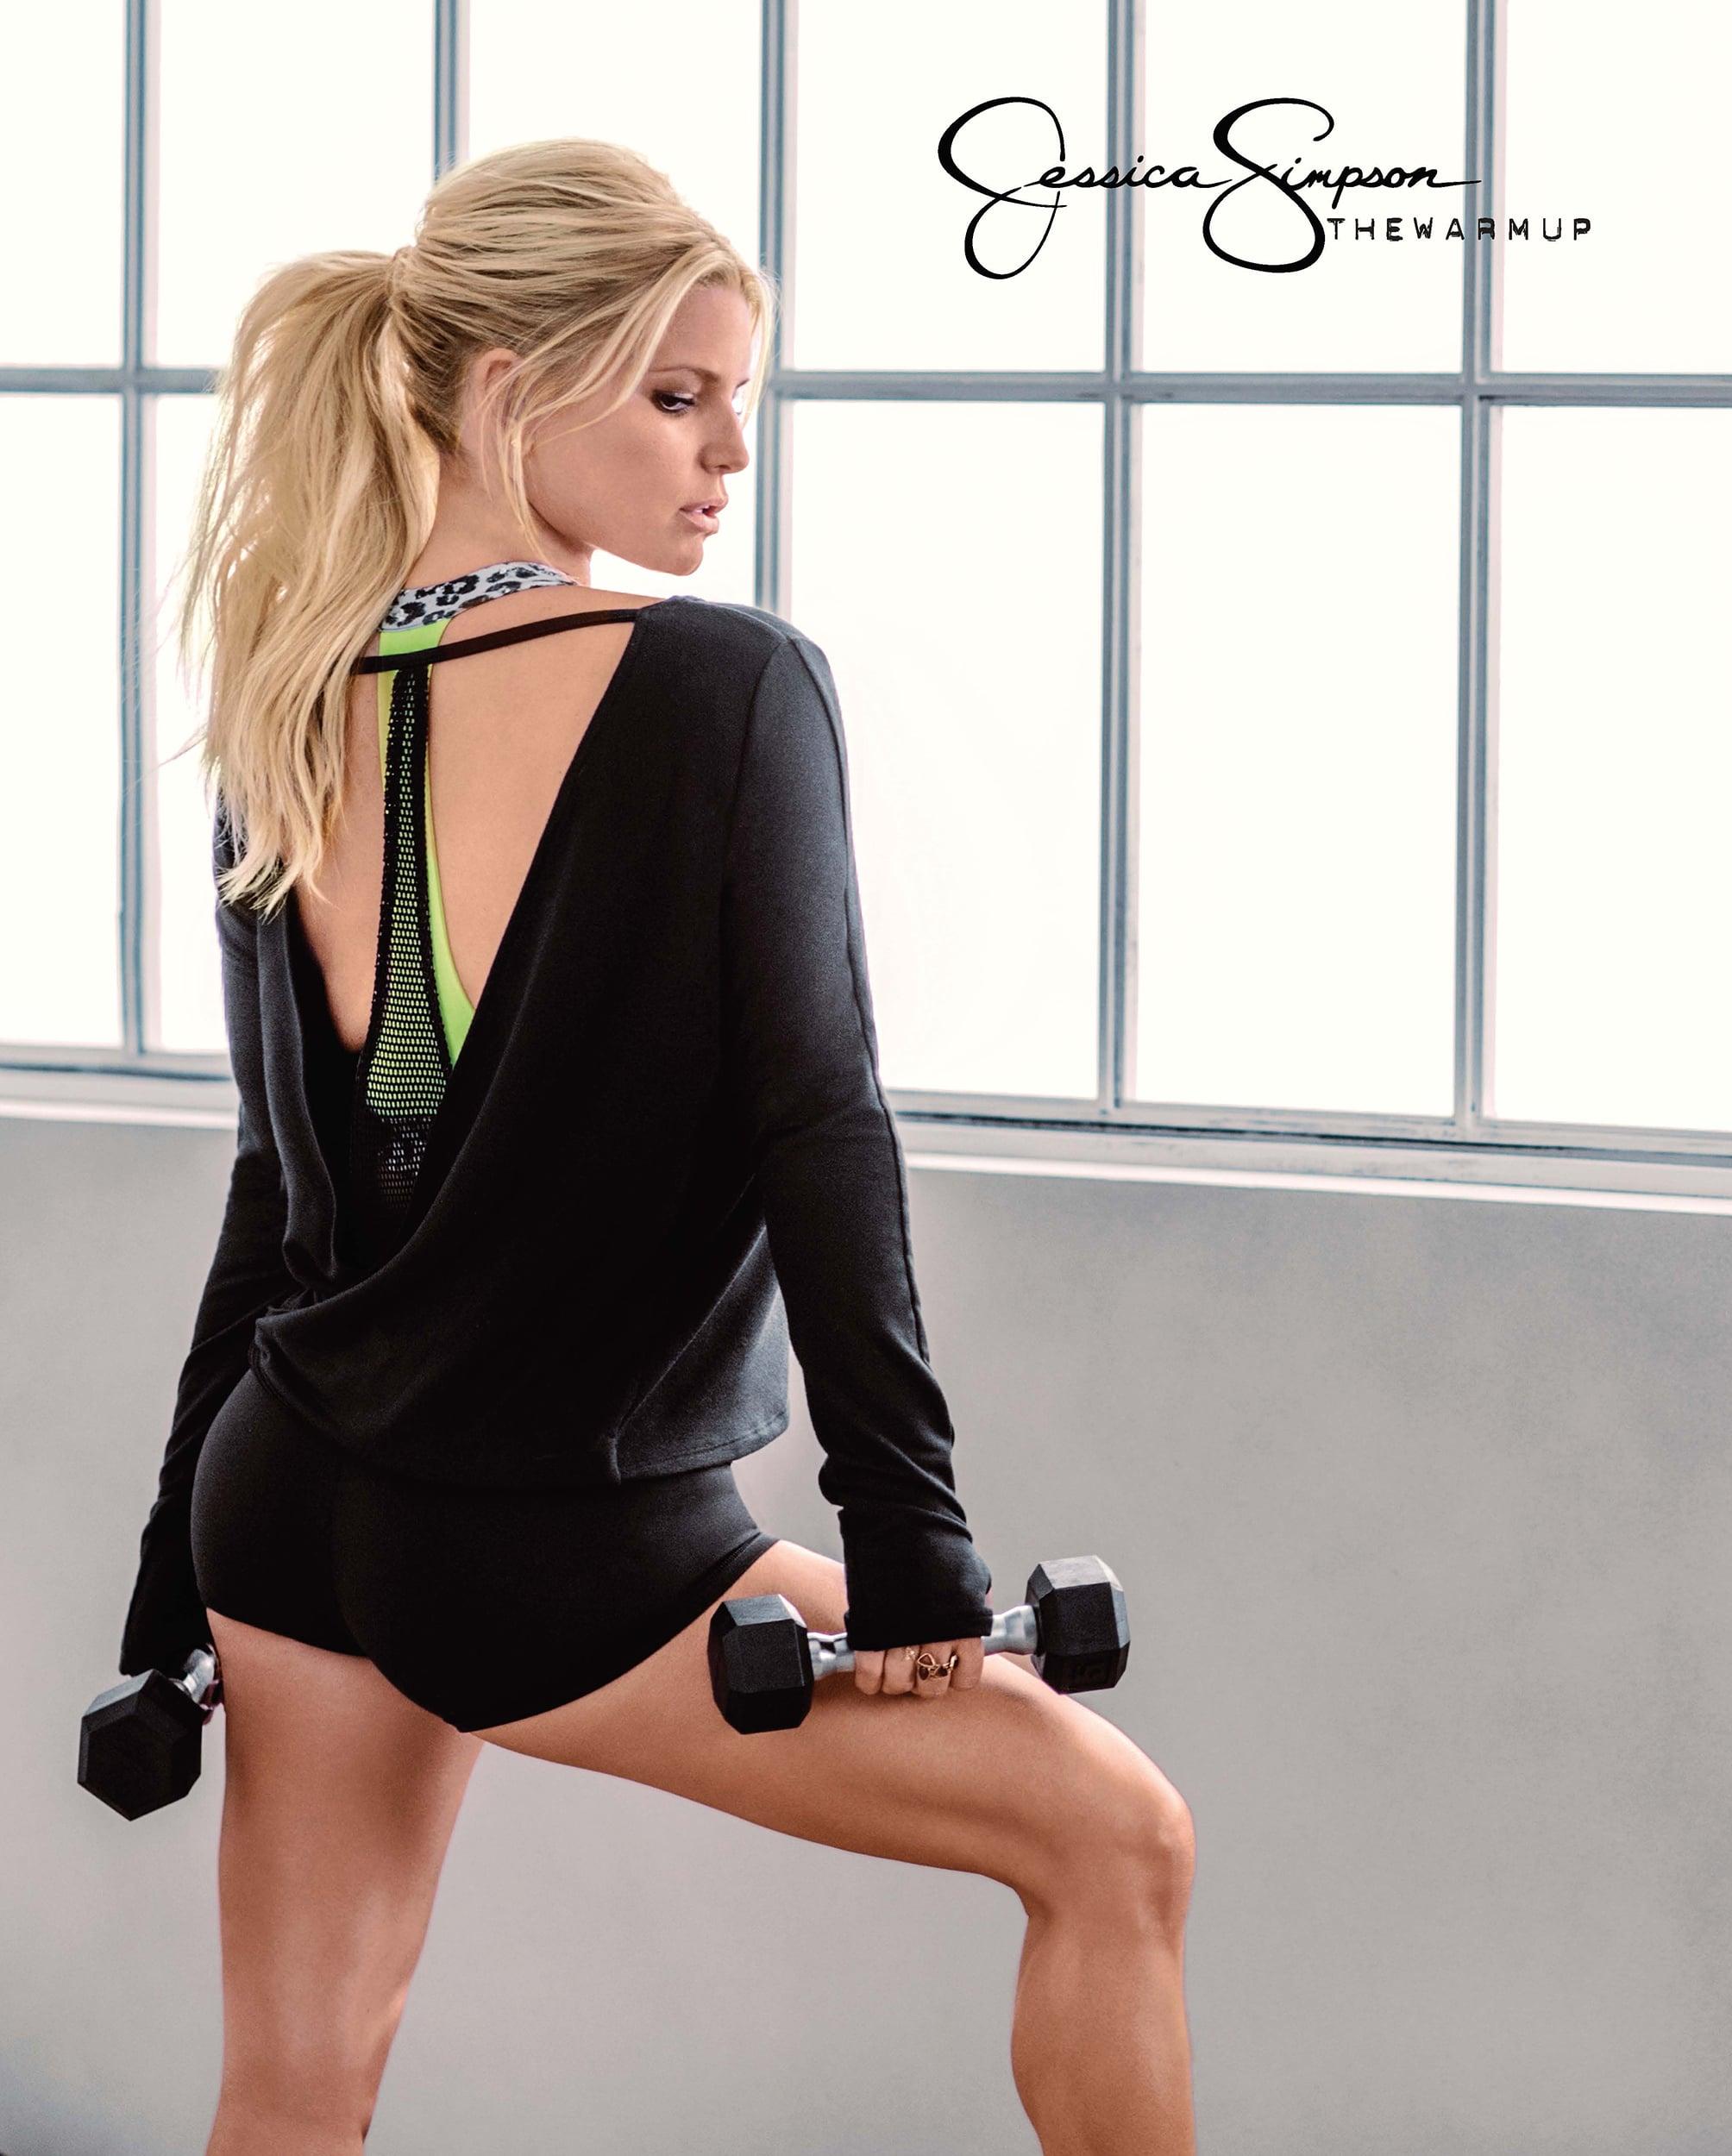 Jessica-Simpson-Fitness-Line-Warm-Up